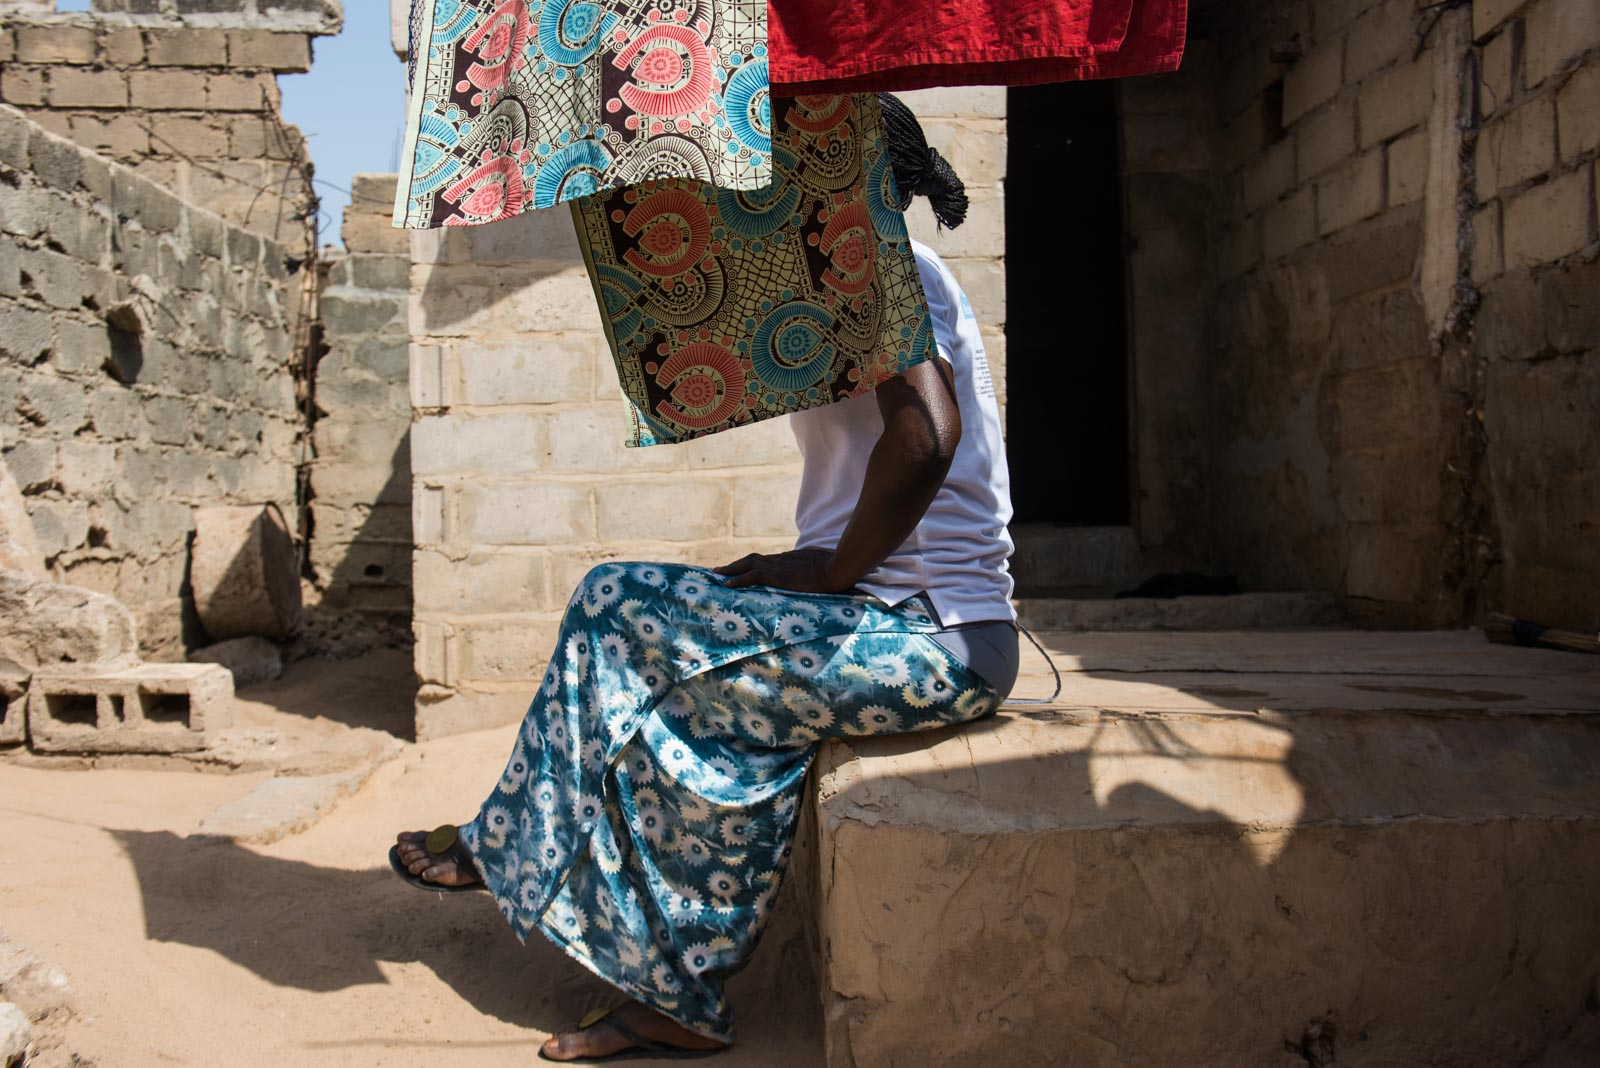 Khadija, photographed at her home in Dakar